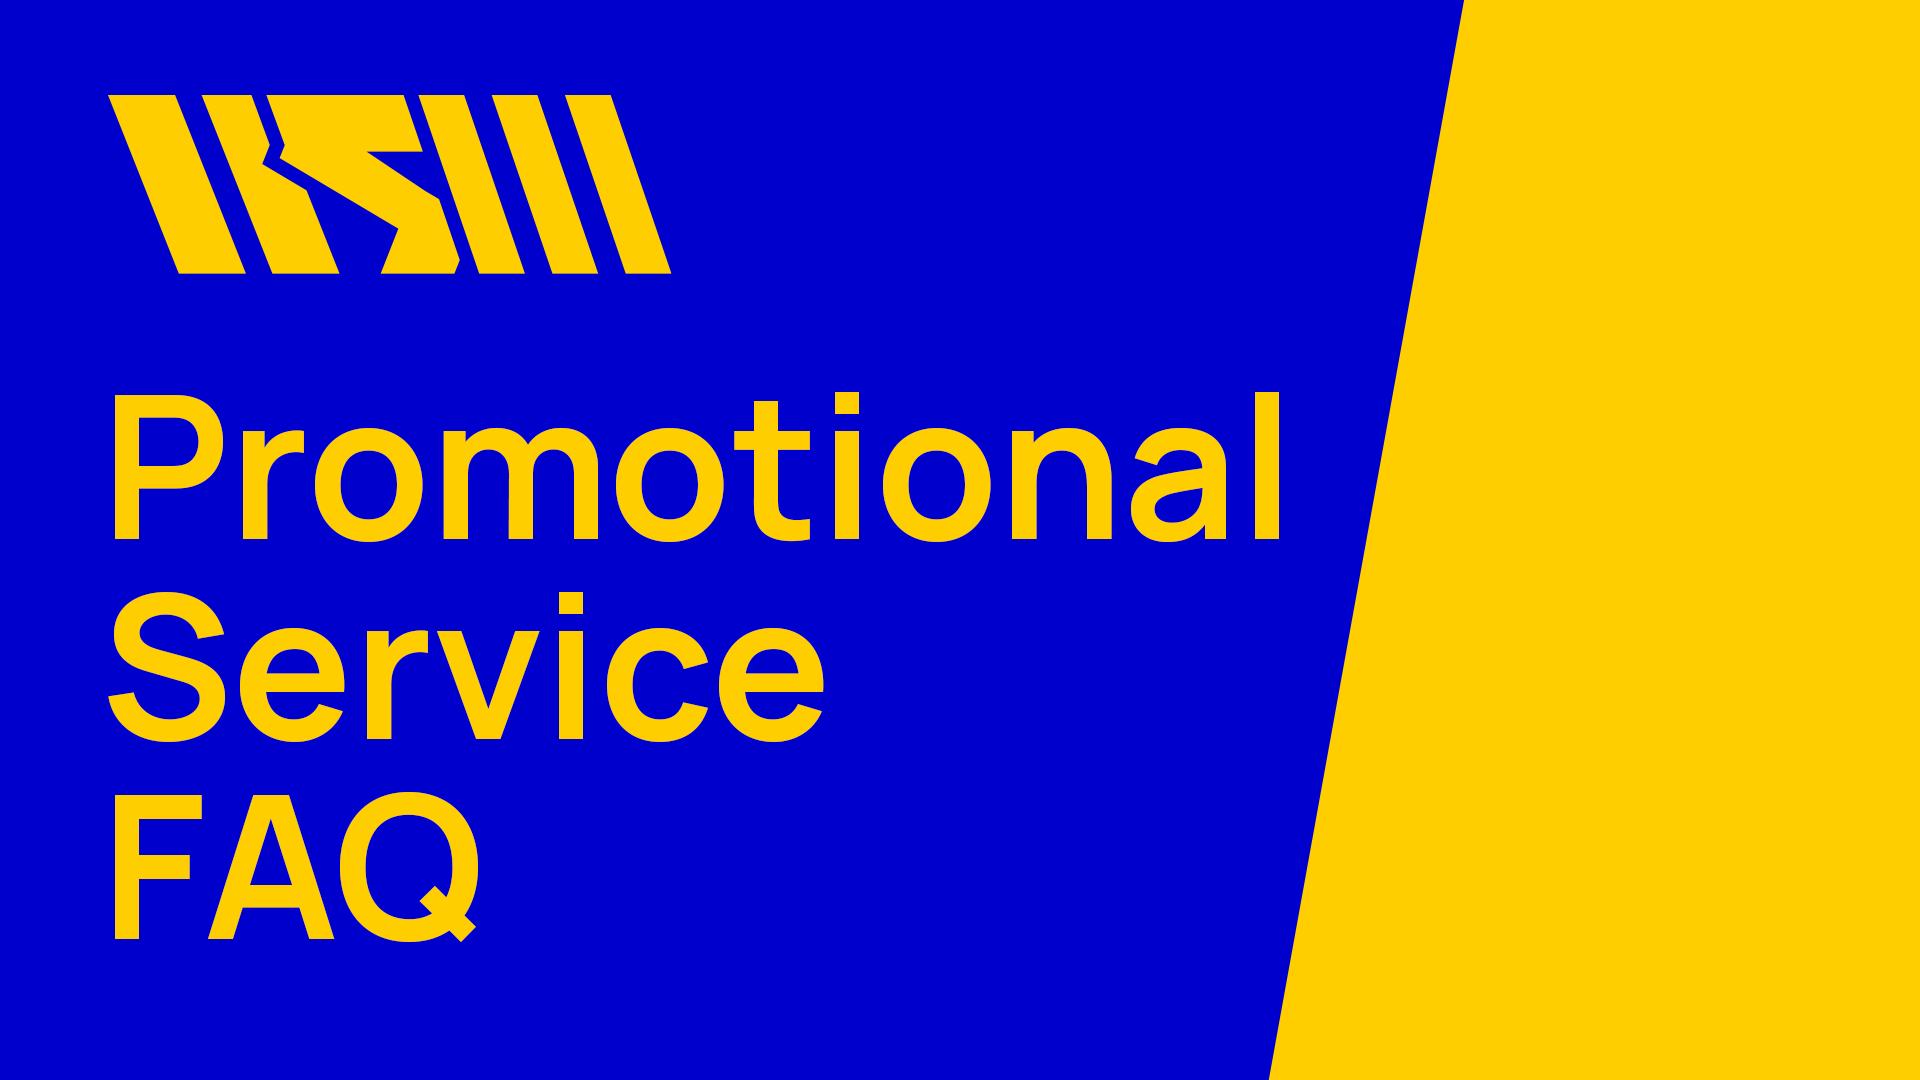 Promotional Service FAQ